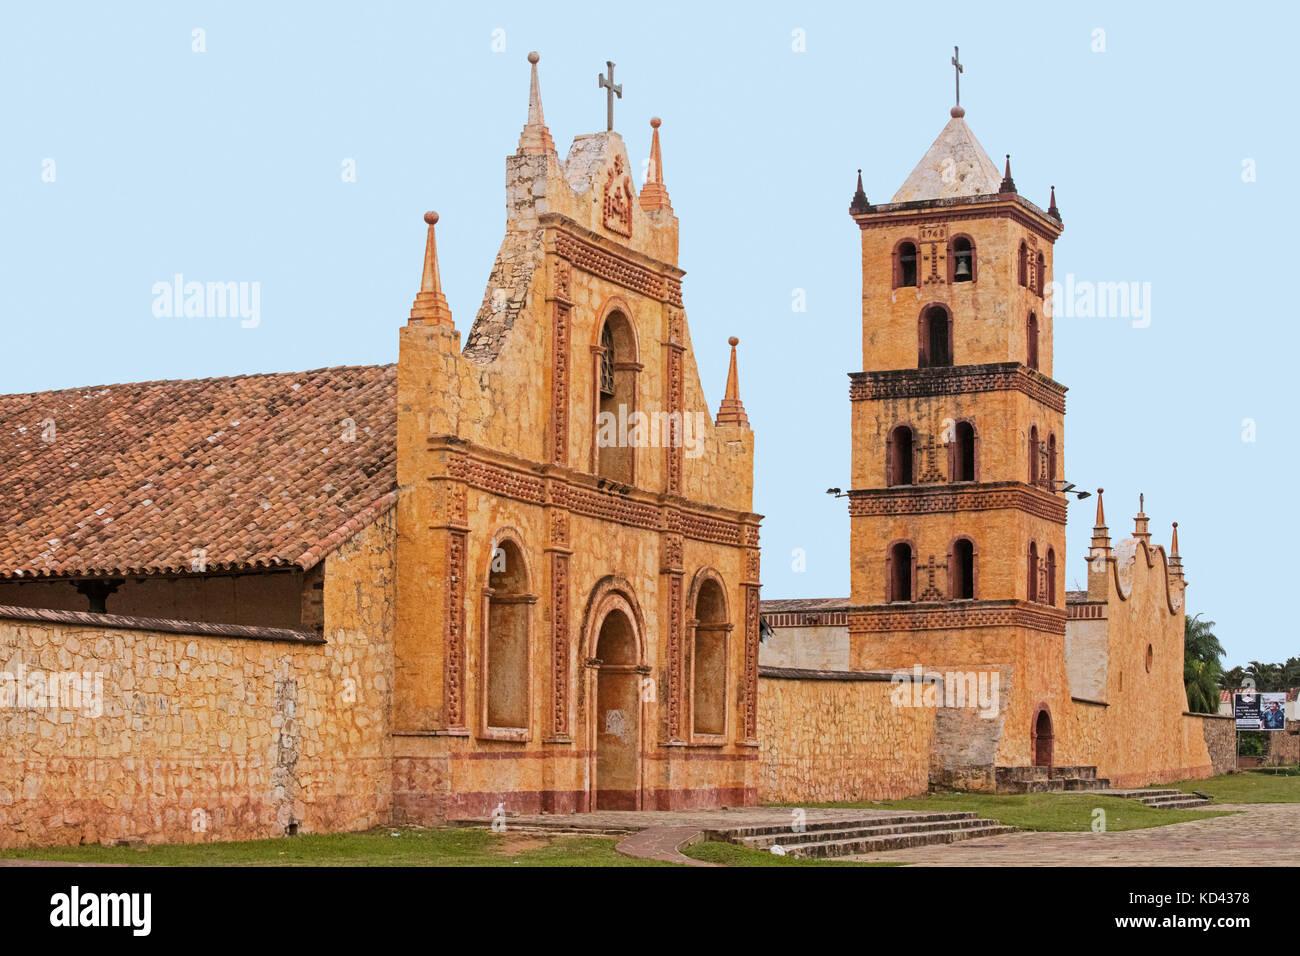 The Jesuit Mission church of San José de Chiquitos, Chiquitos Province, Santa Cruz, Bolivia - Stock Image